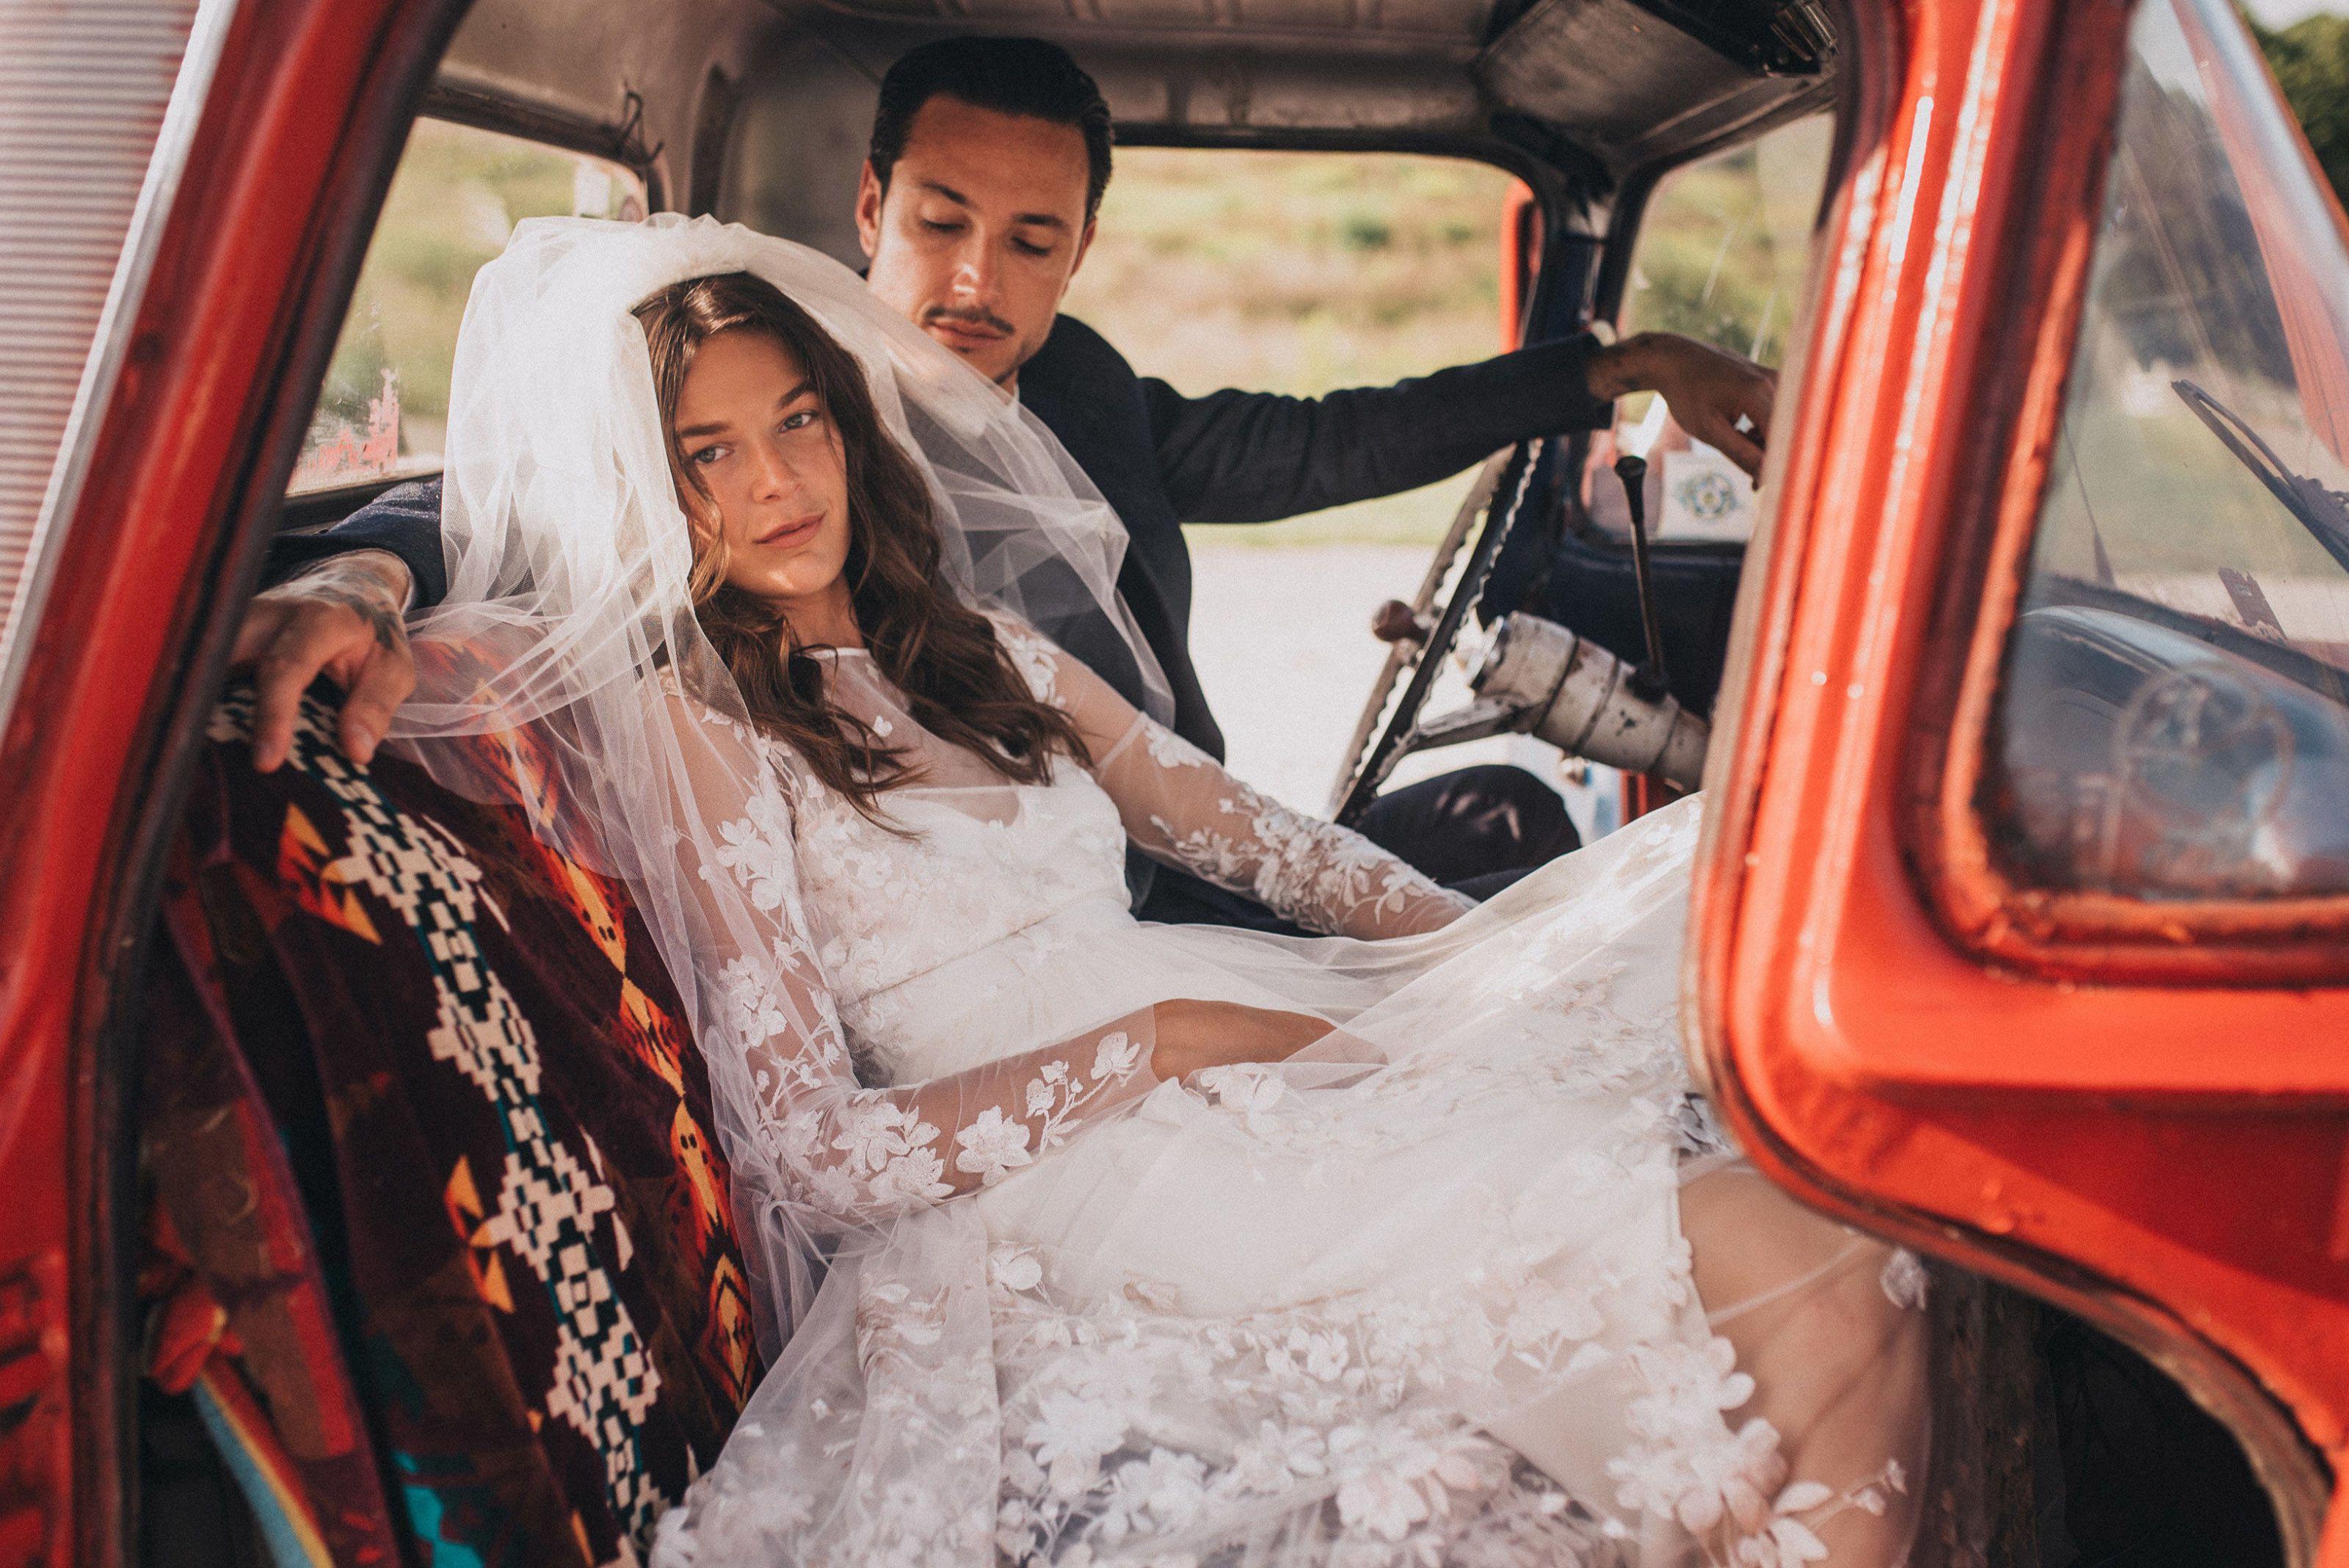 BAZAAR Bride's Little Black Book: The Top Wedding Photographers in the World